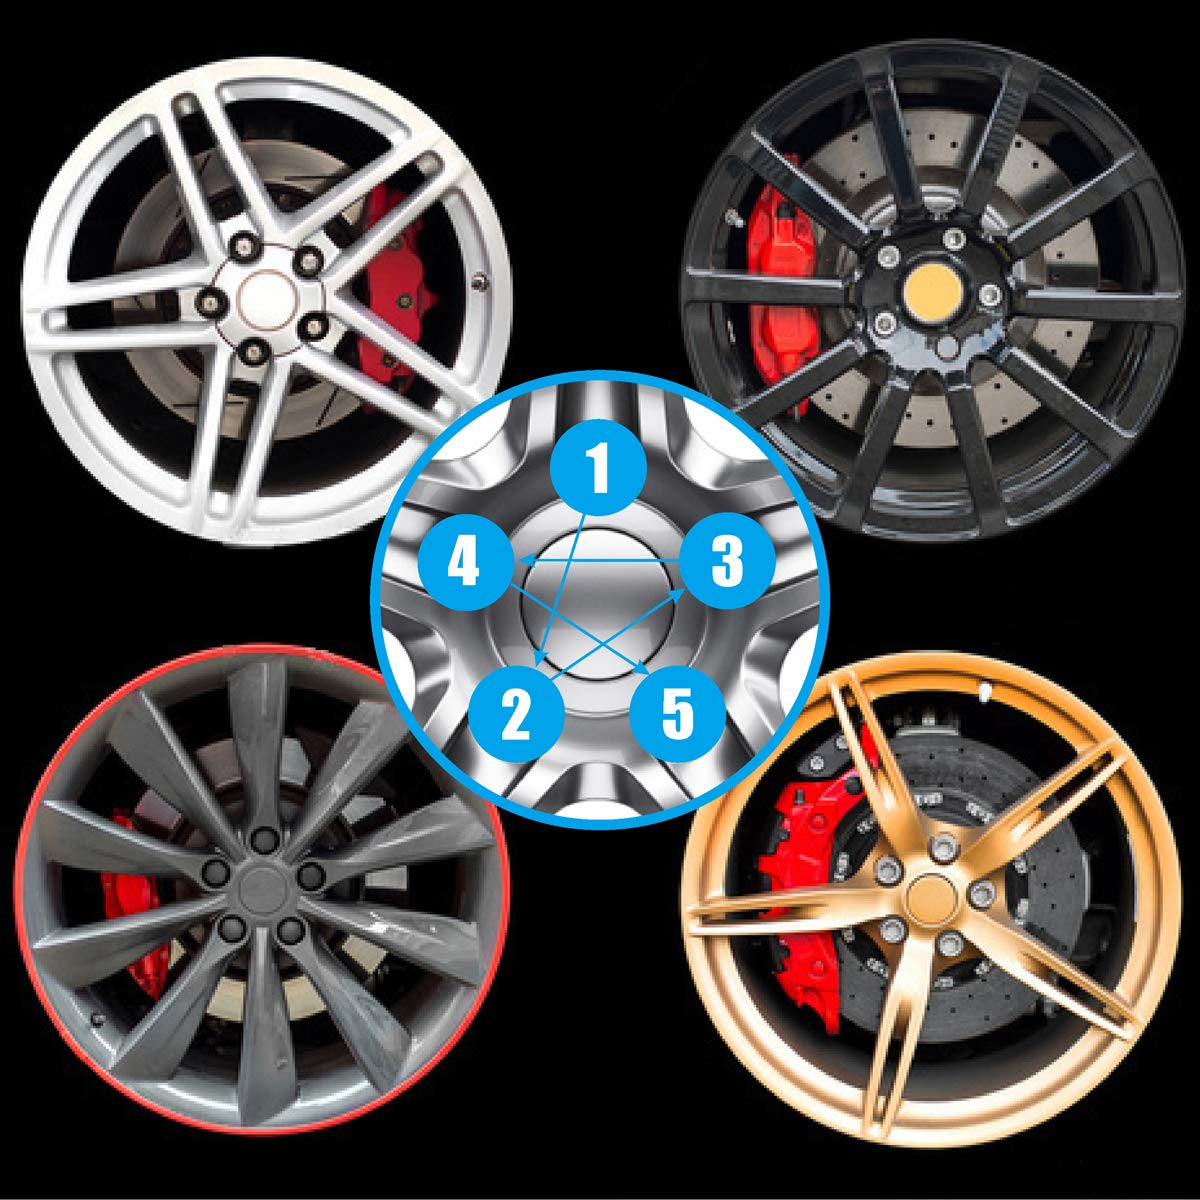 Dynofit 12mmx1.5 Wheel Lug Nuts Conical//Cone Bulge Seat Closed End Duplex Nuts 1.38 Tall 3//4Hex Size Fits Honda Acura Toyota Lexus Scion Aftermarket 5 Lug Wheels 20 Black M12x1.5 Lug Nut